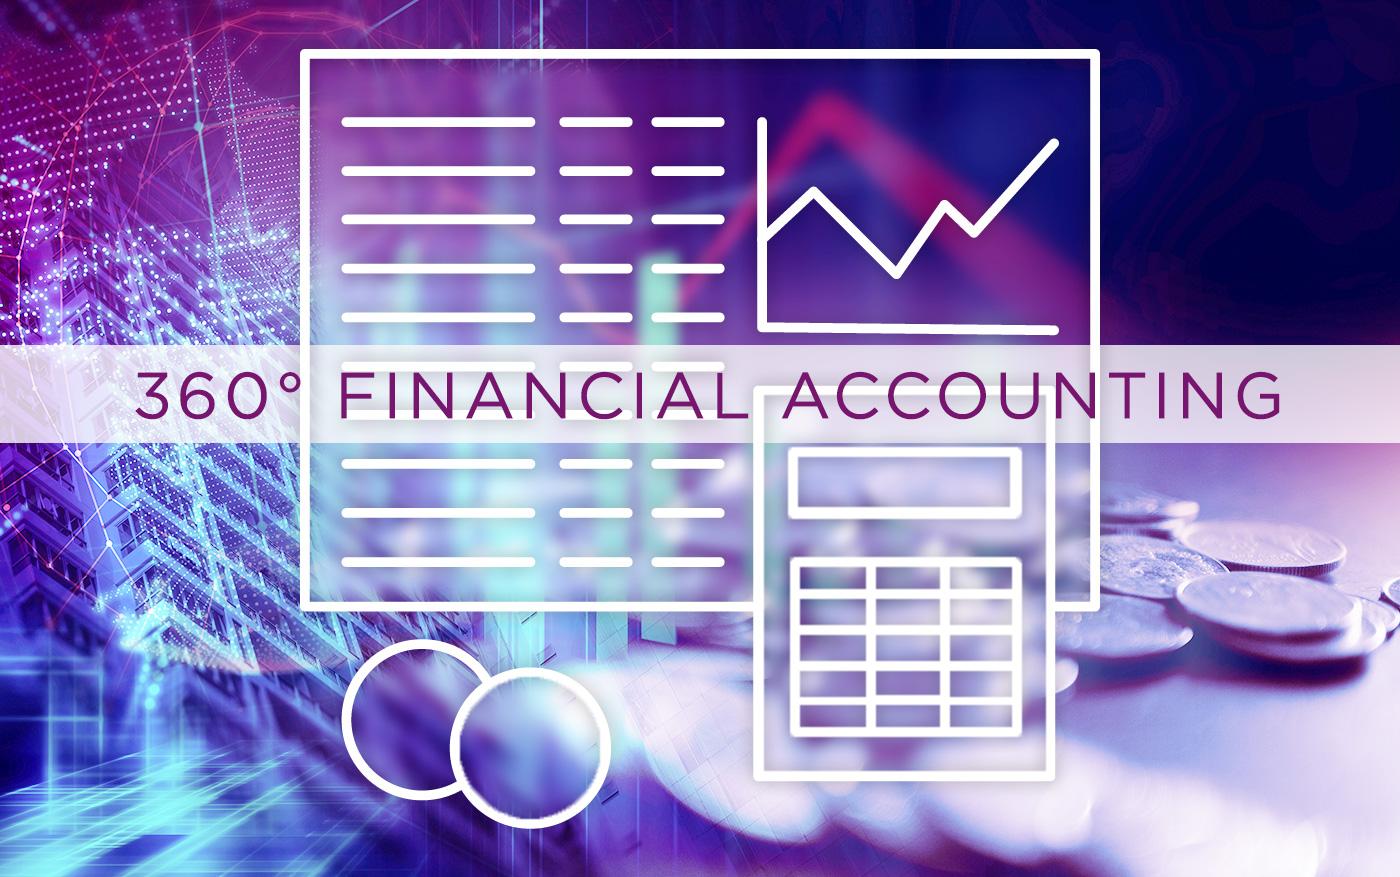 360 financial accounting